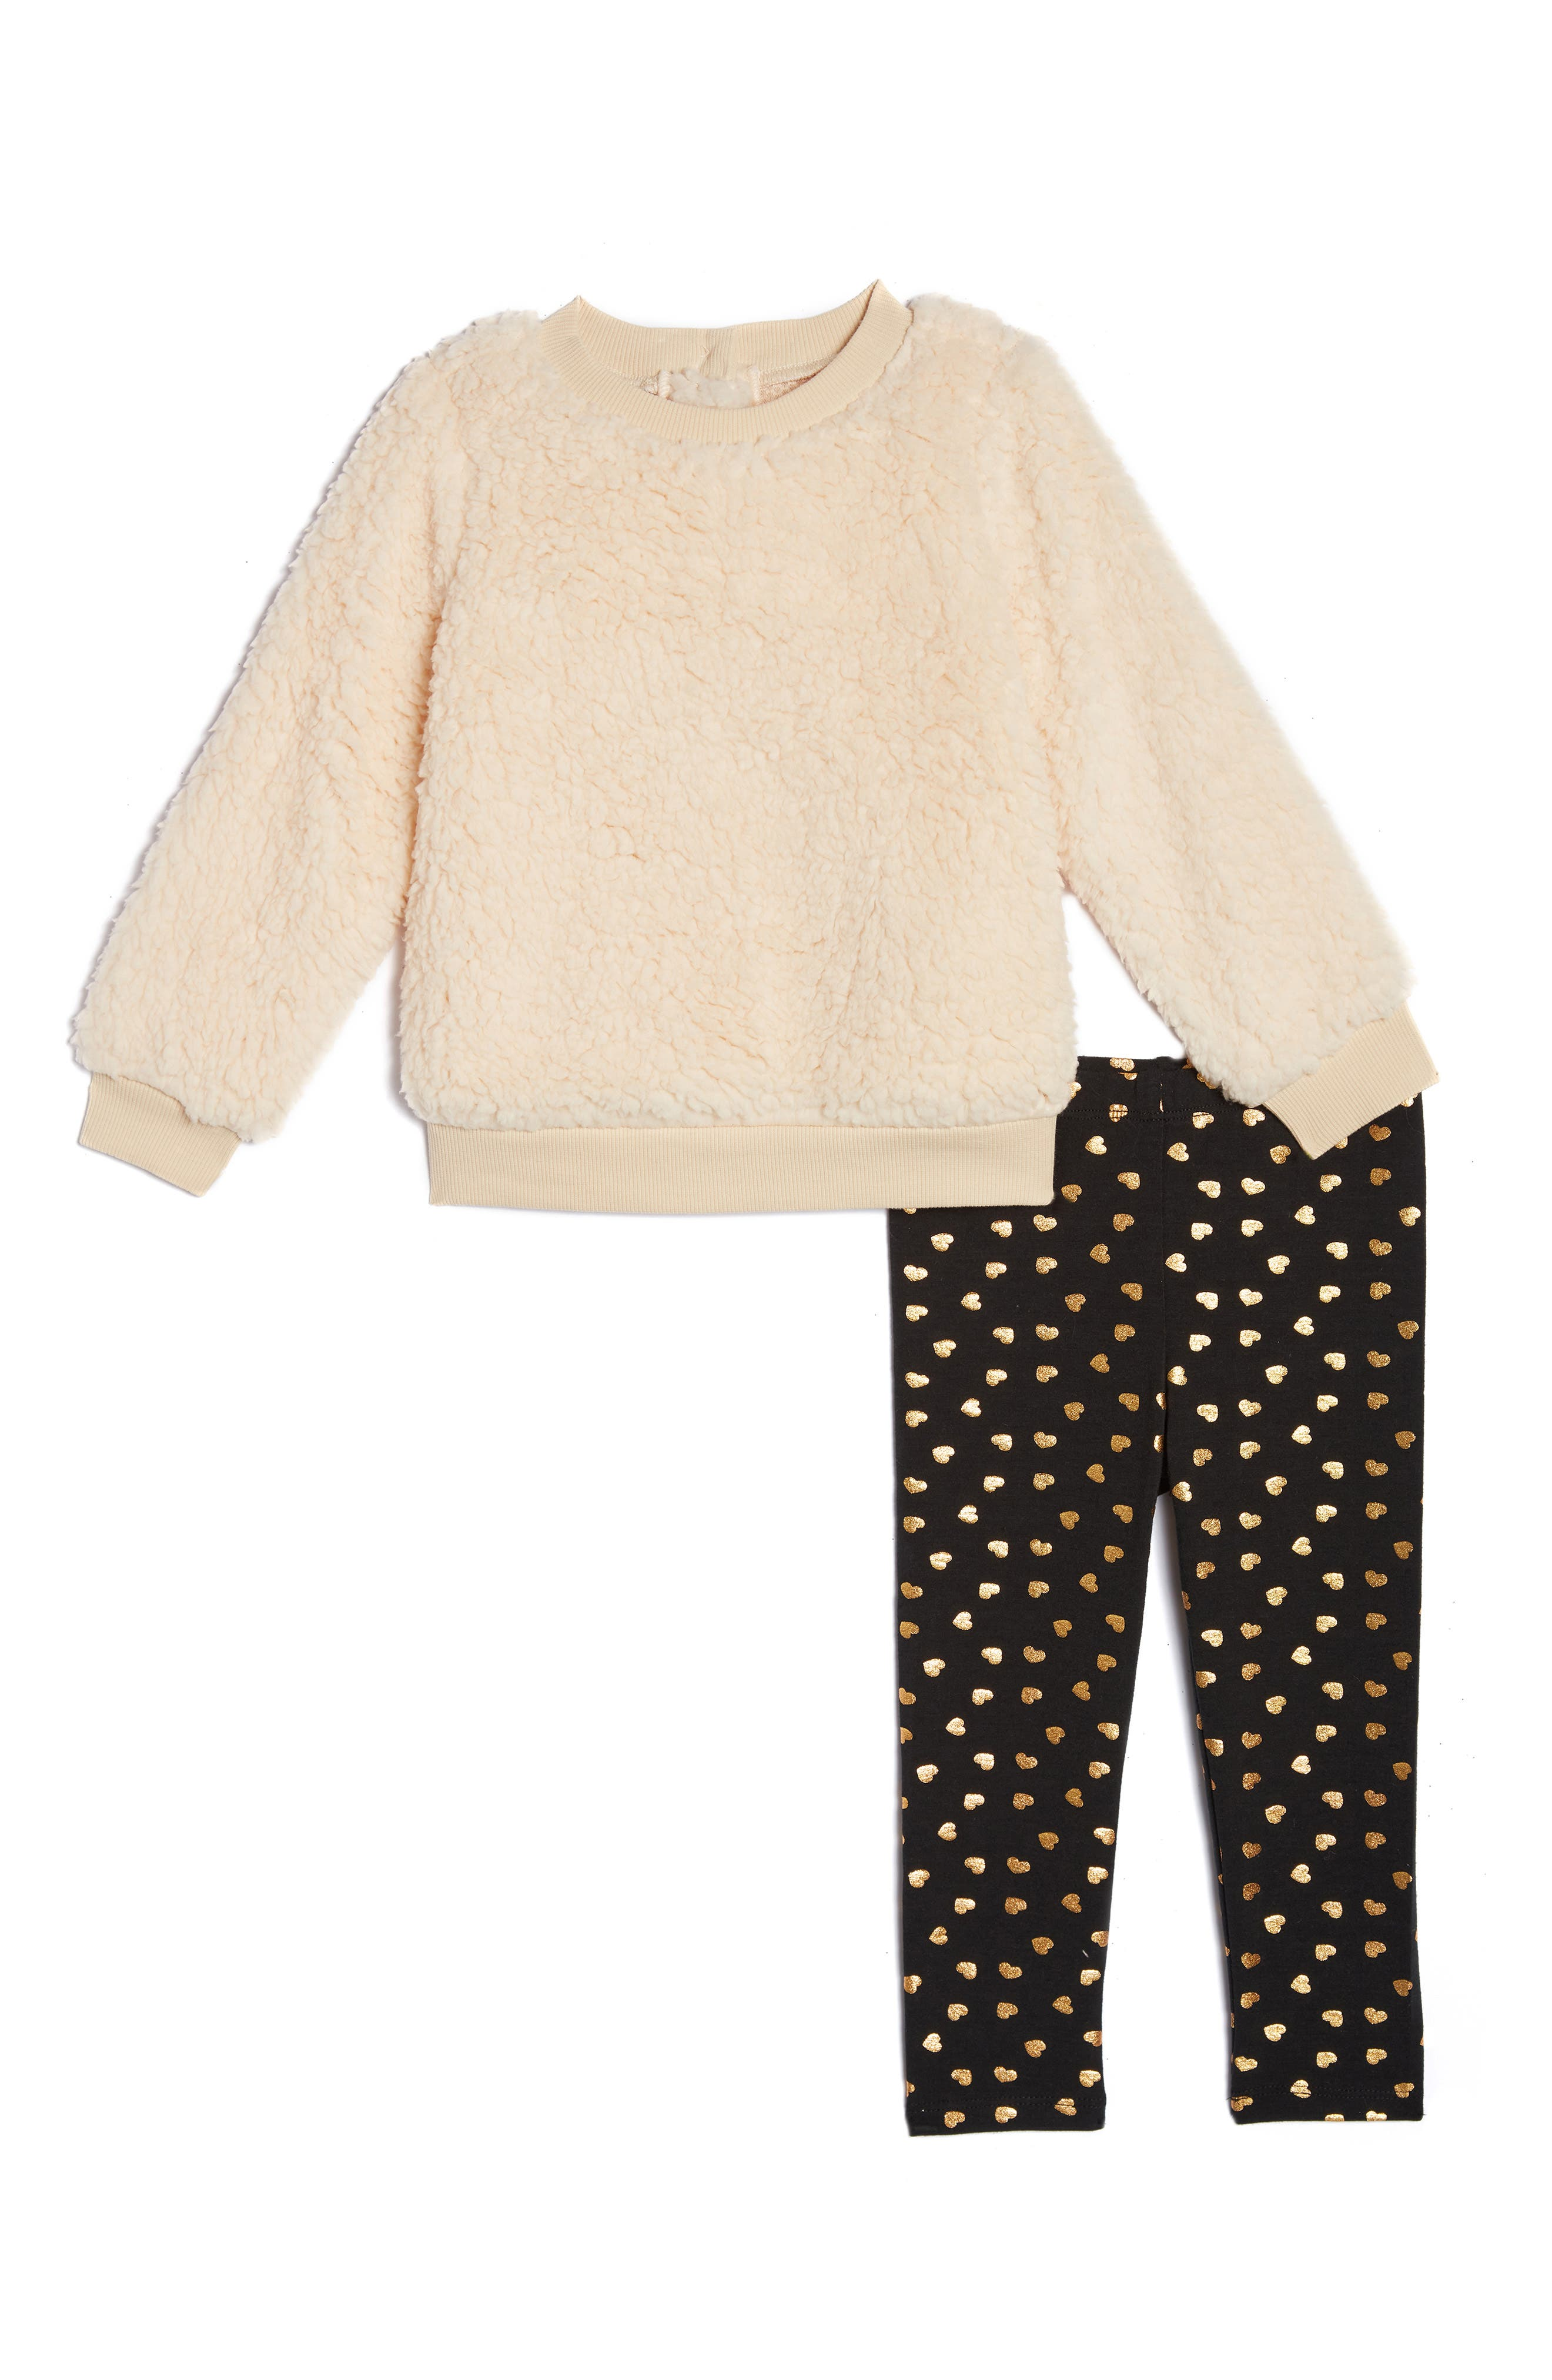 Image of Pippa & Julie Faux Shearling Foil Heart Sweater & Leggings 2-Piece Set